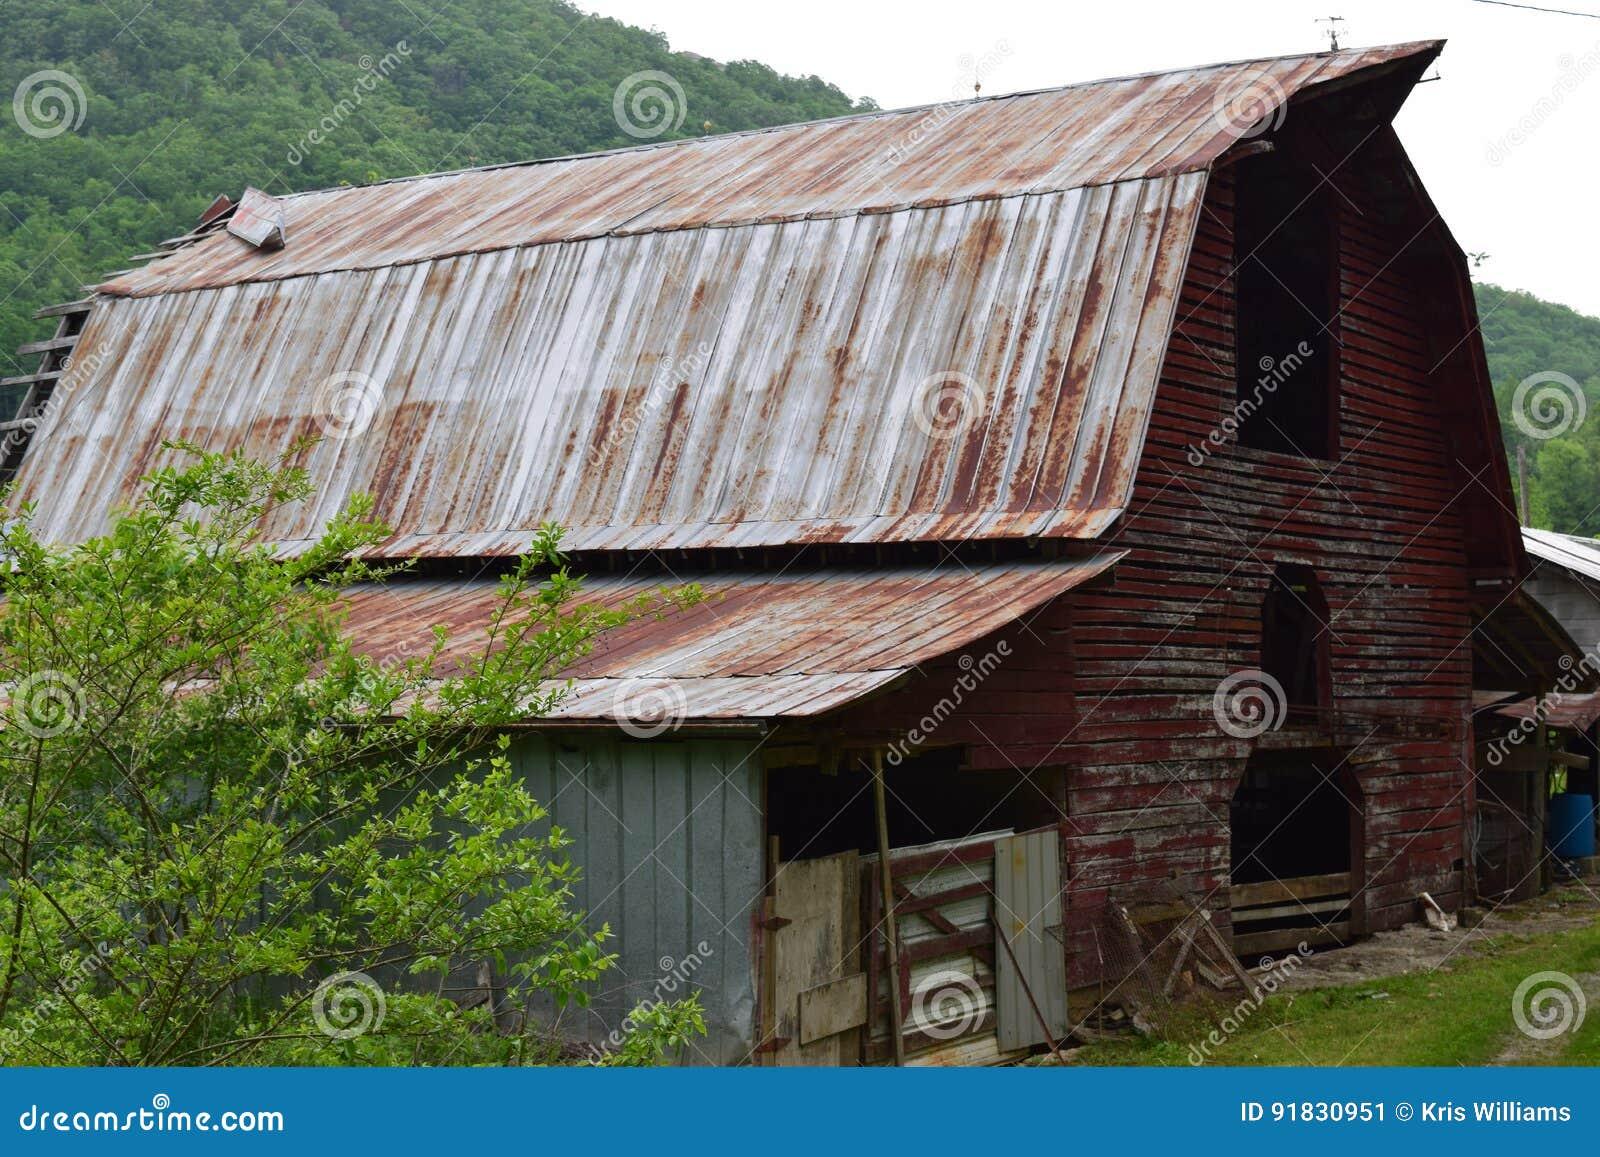 Western NC mountain old rural farm barn